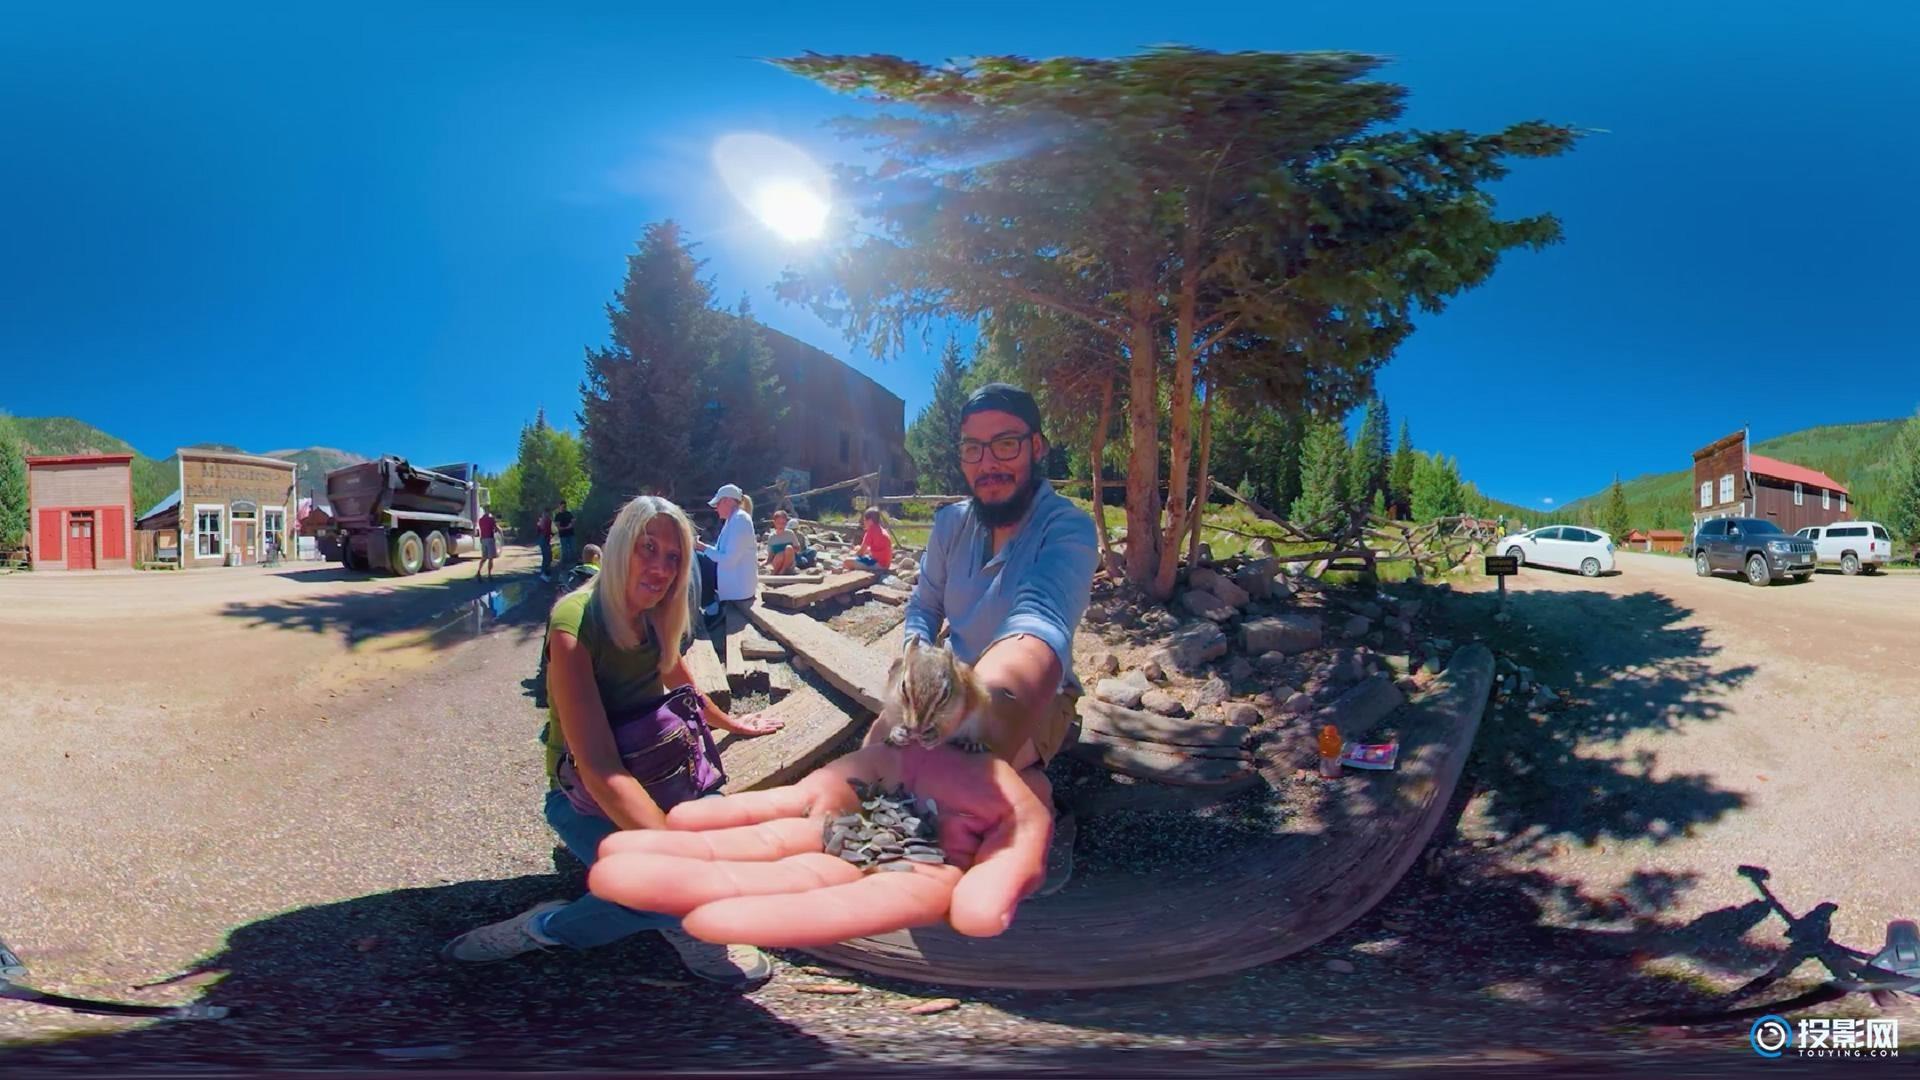 [VR360°全景] 美国科罗拉多州风景混剪 VR视频下载